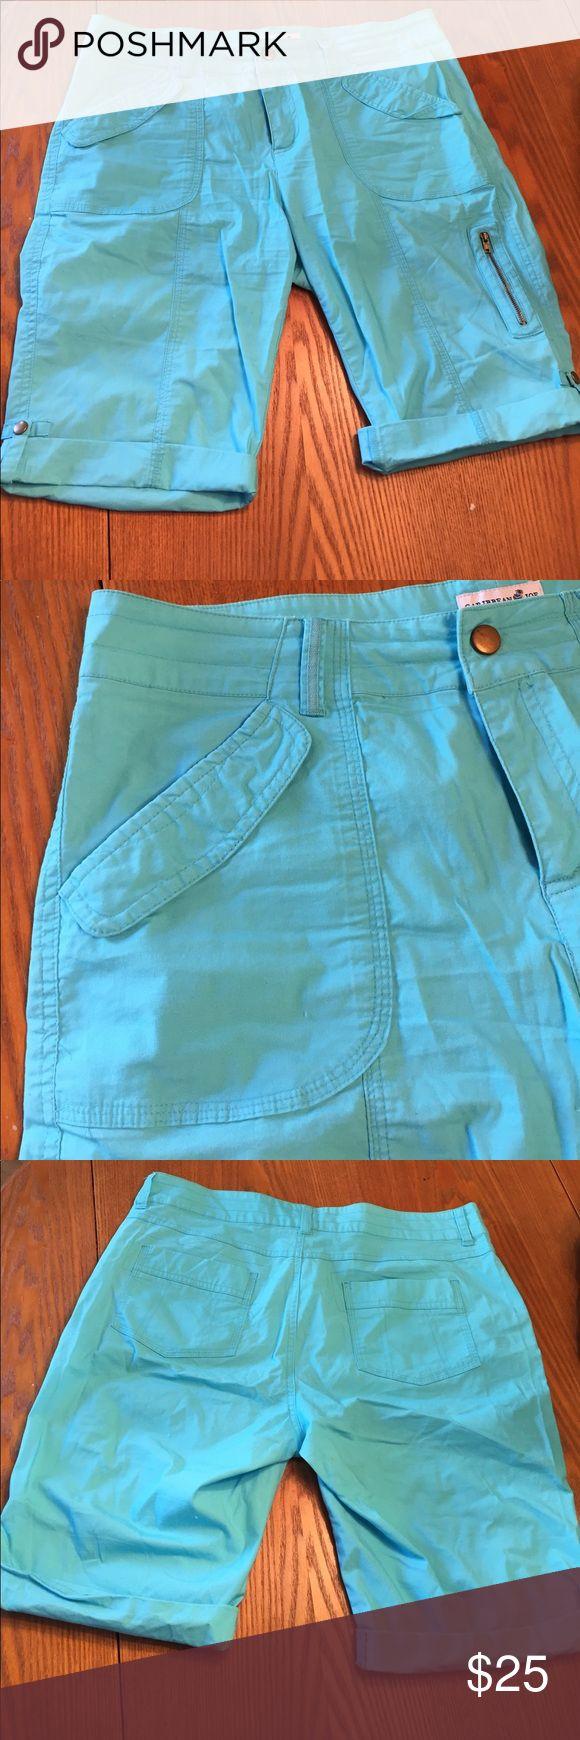 Caribbean Joe Bermuda shorts size 10 brand new Caribbean Joe Bermuda shorts size 10 brand new 97 cotton 3 spandex Shorts Bermudas